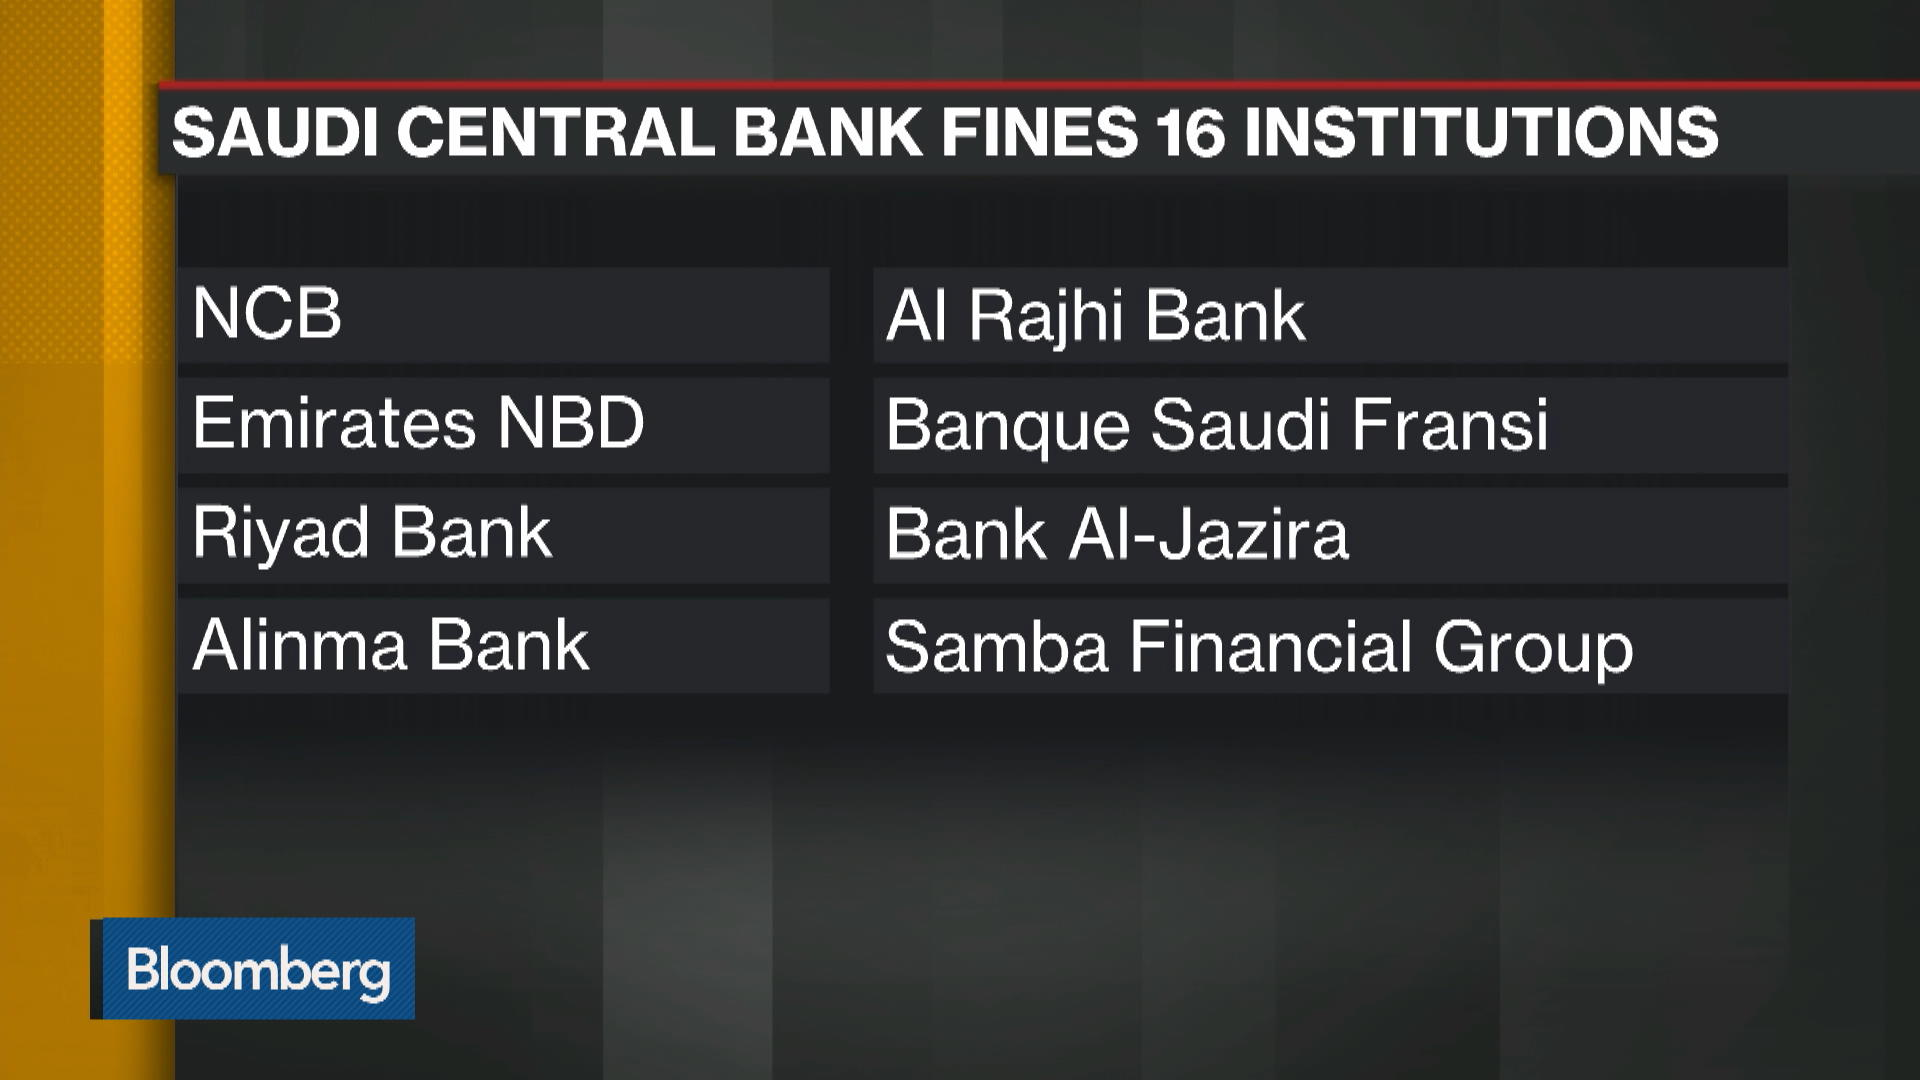 Saudi Central Bank Fines 16 Banks